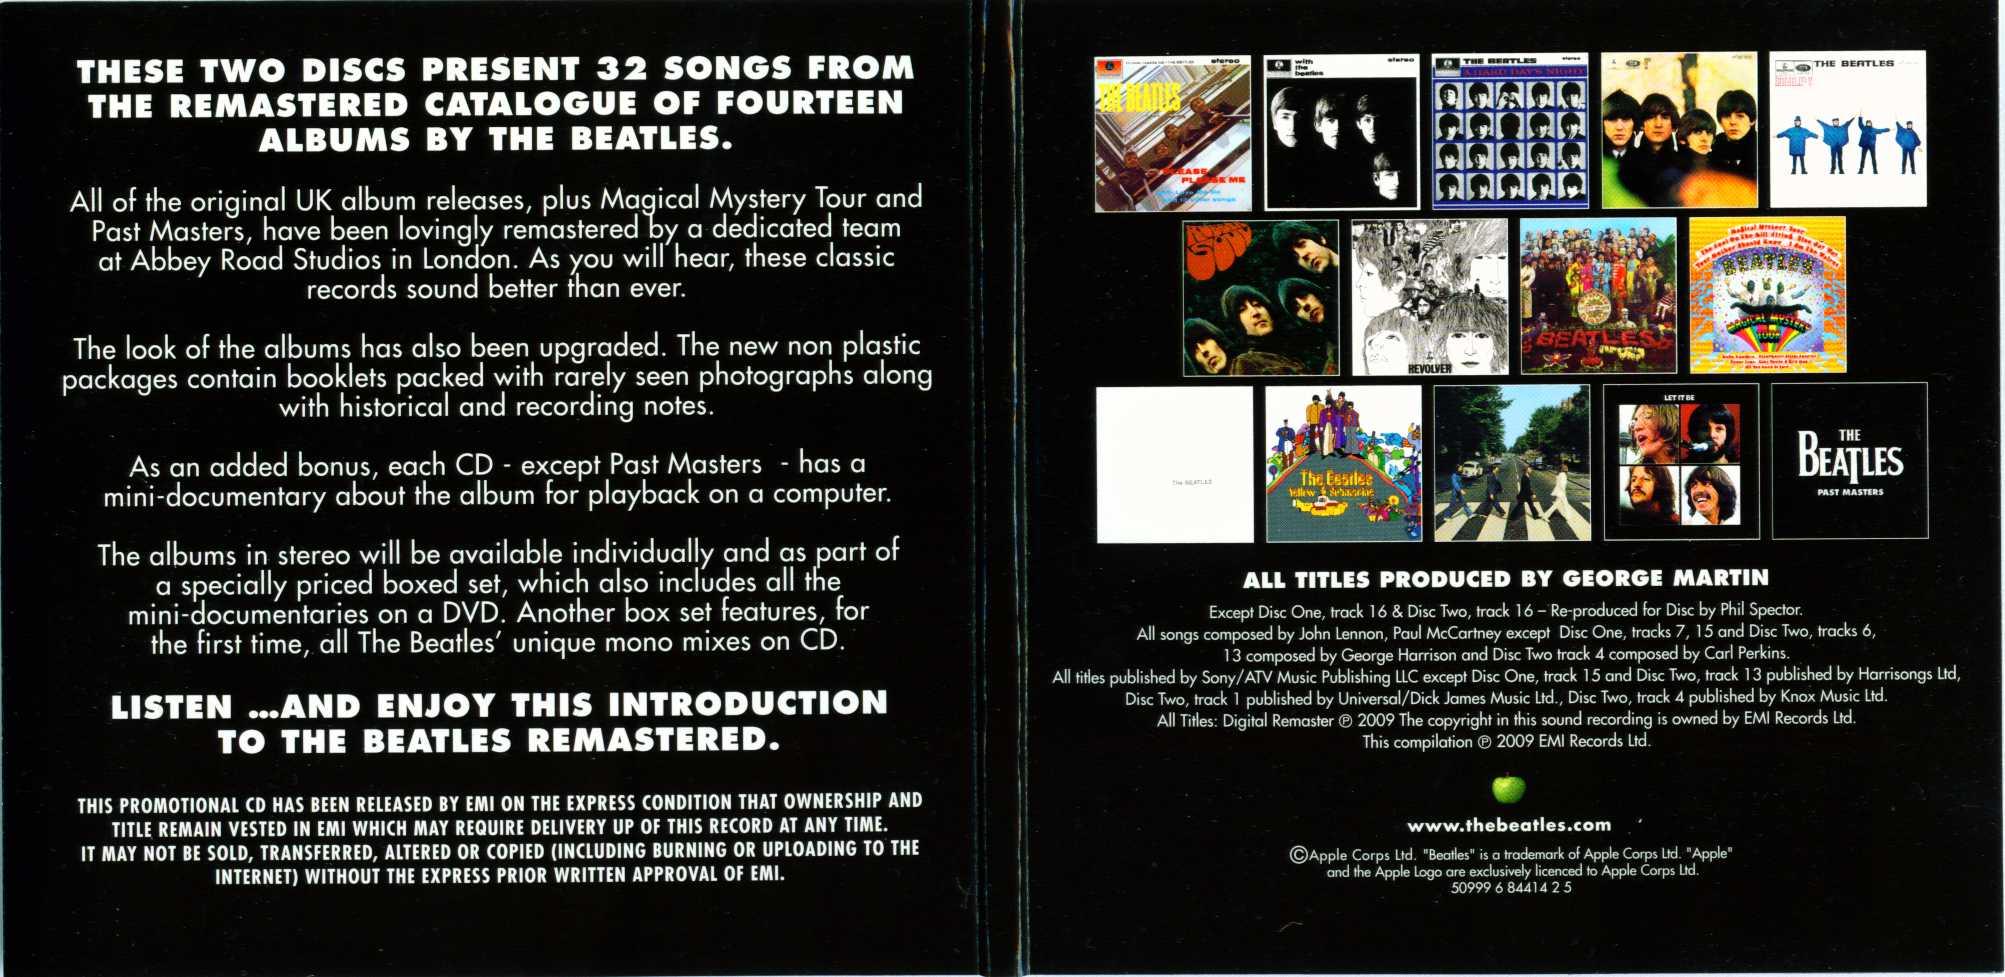 The Beatles Remastered Box Set Sampler